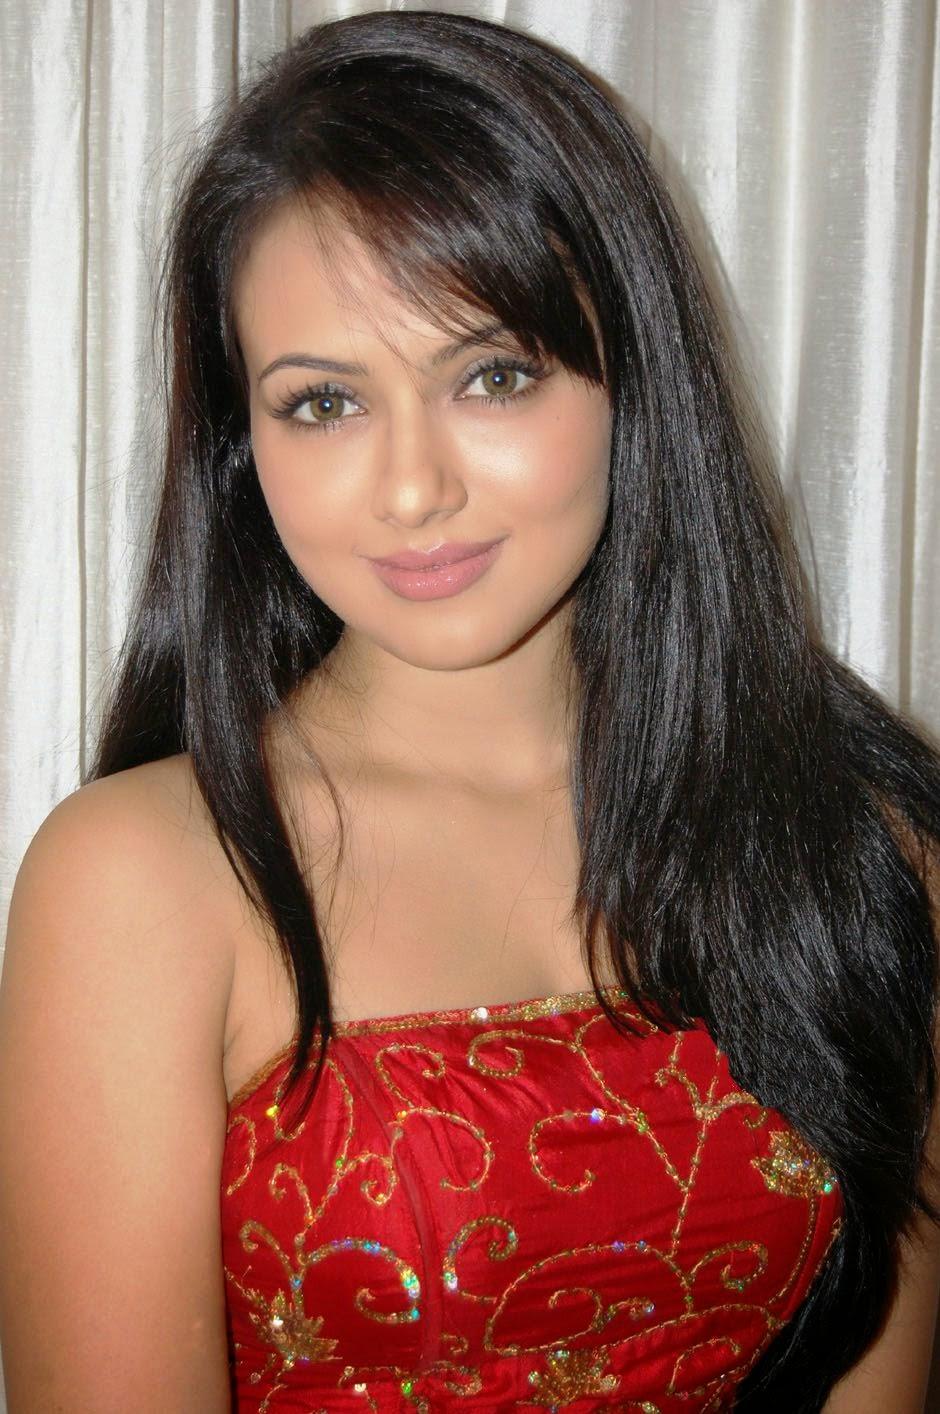 Bigg Boss Contestant And Model Sana Khan Unseen Hot Pics -2445